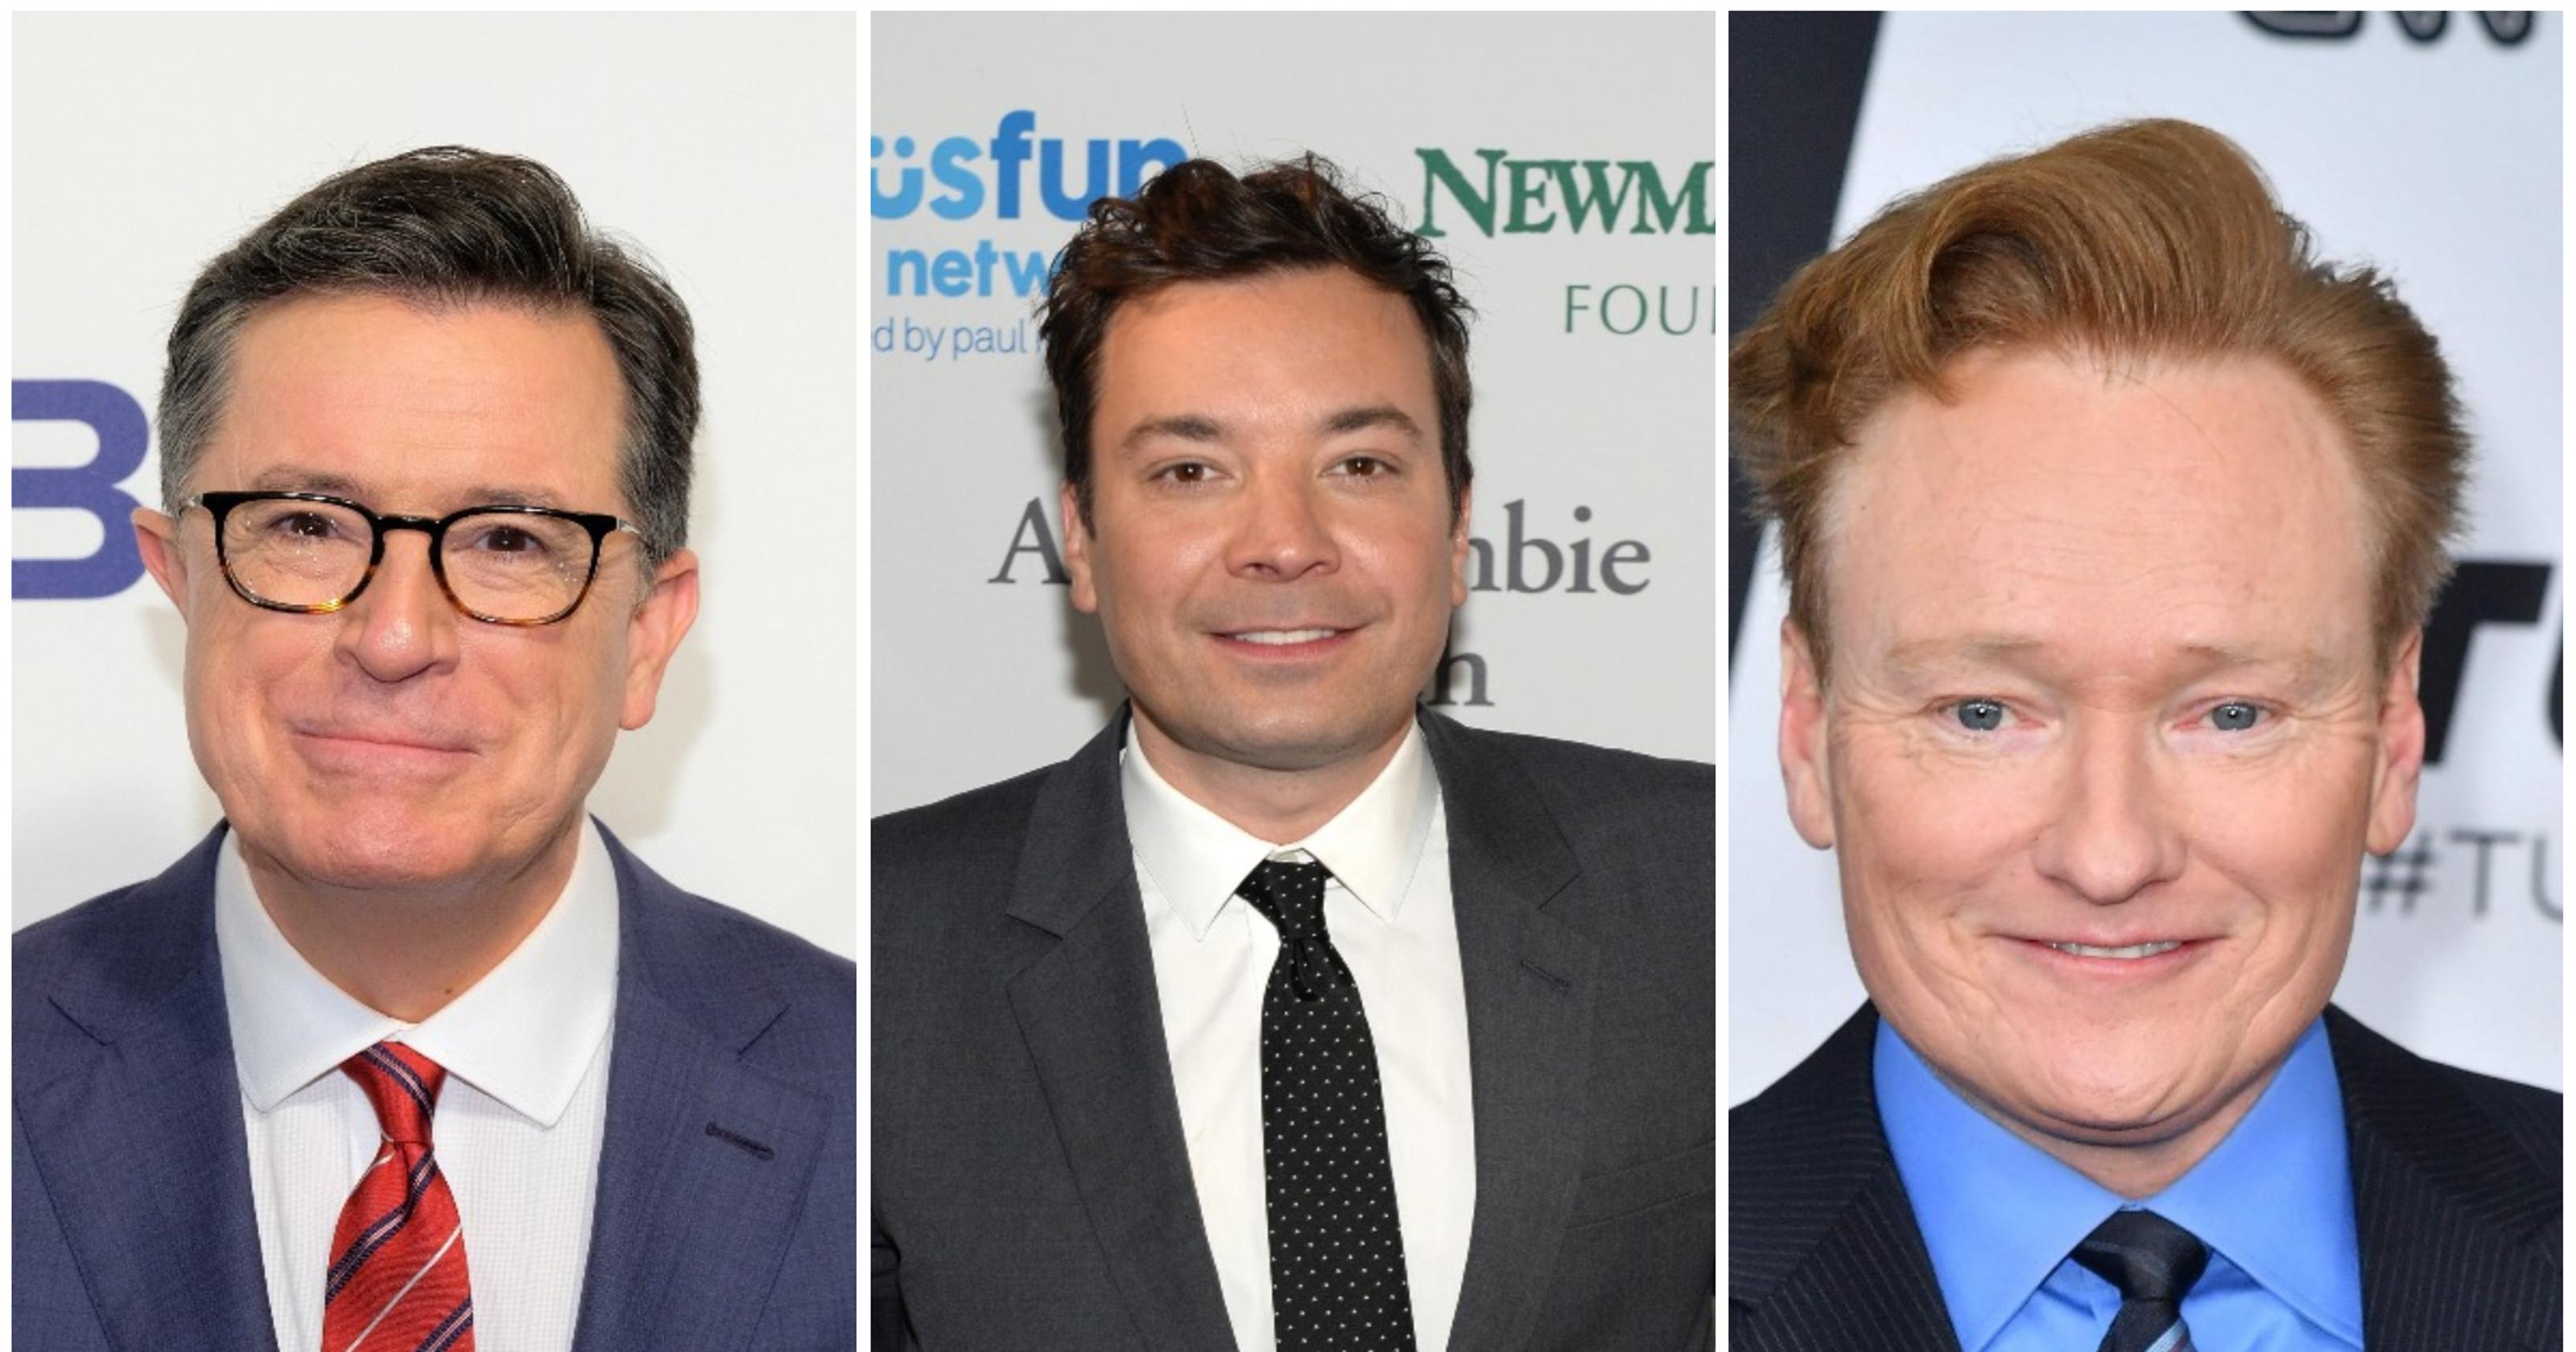 Colbert, Fallon, Conan team for response to Donald Trump\'s insults